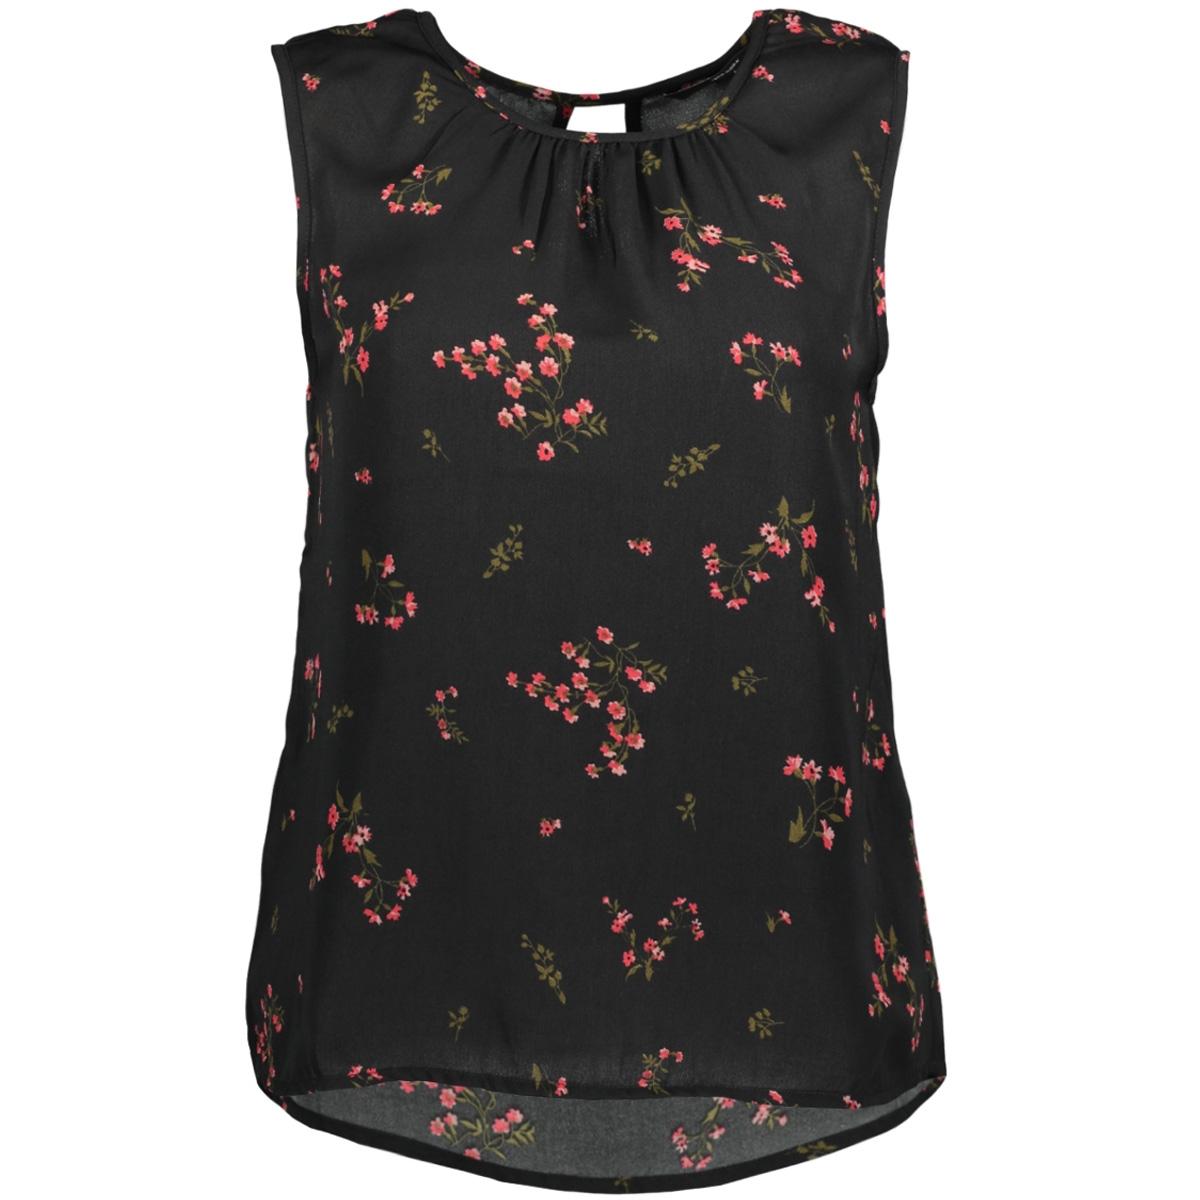 vmparisan s/l top d2-8 10189801 vero moda top black/flora prin